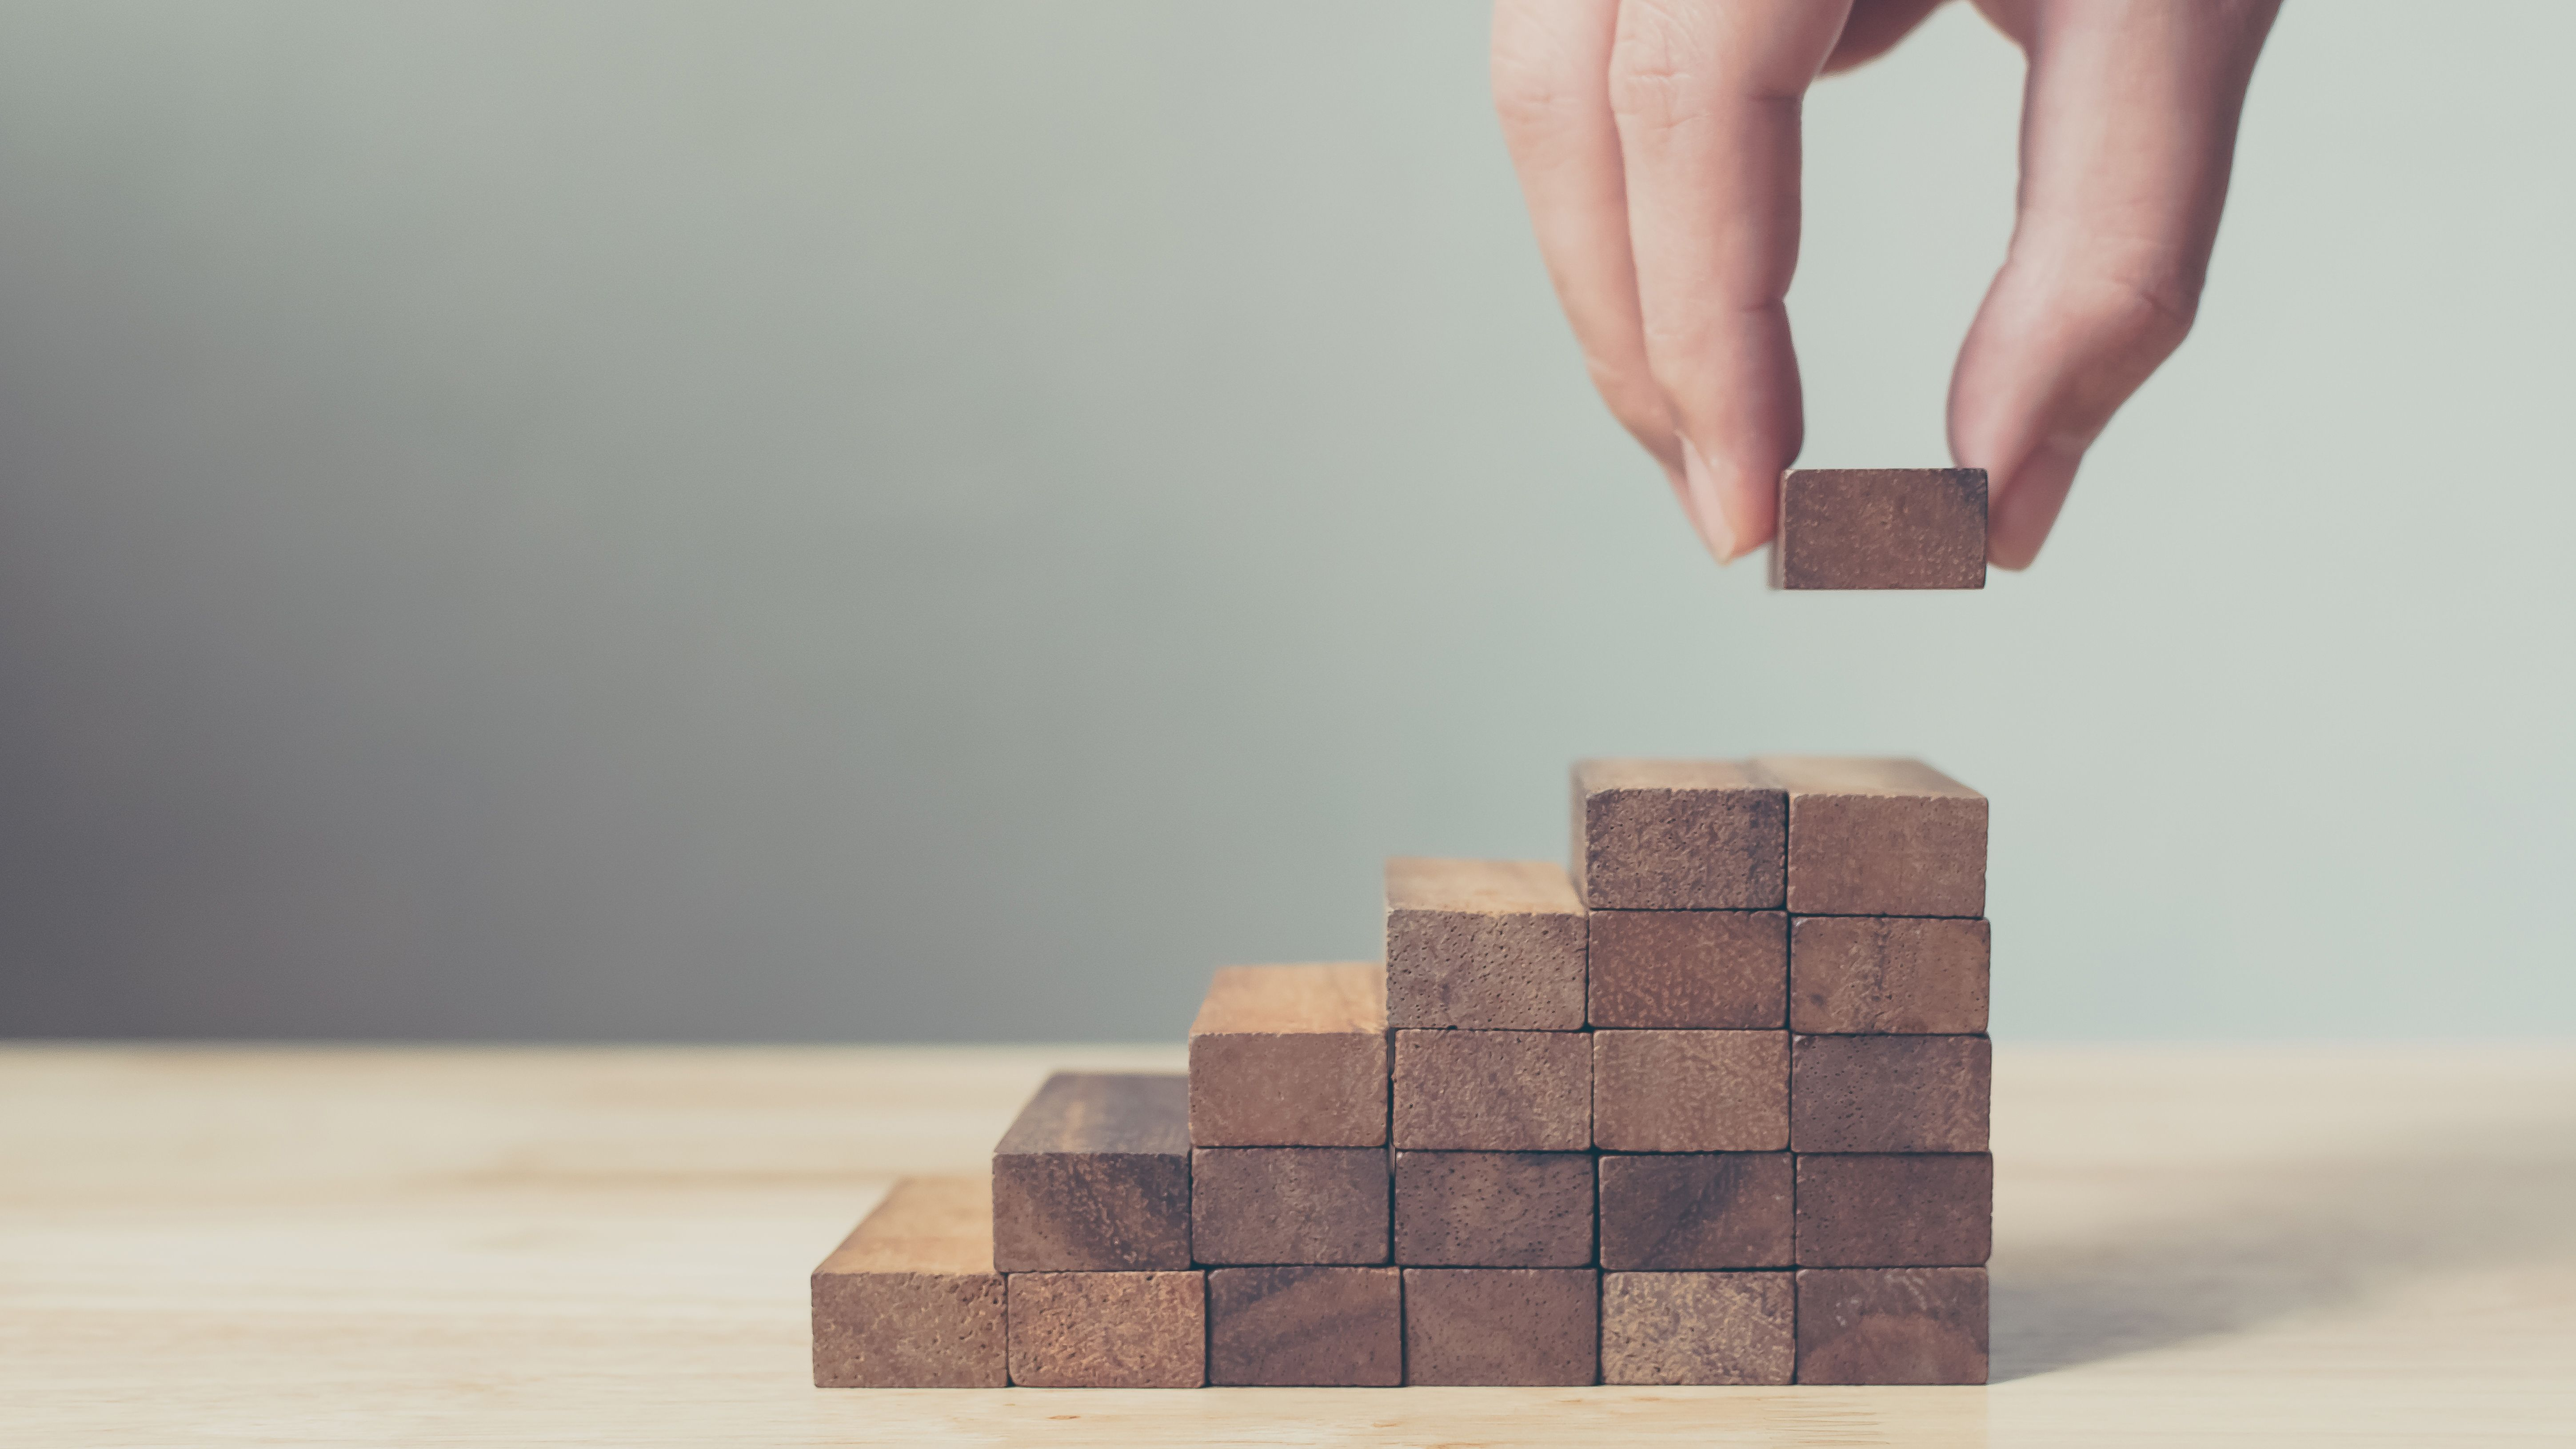 Linus Capital: Rekordjahr für Berliner Immobilien-Investmentplattform – Transaktionsvolumen 2019 verzehnfacht